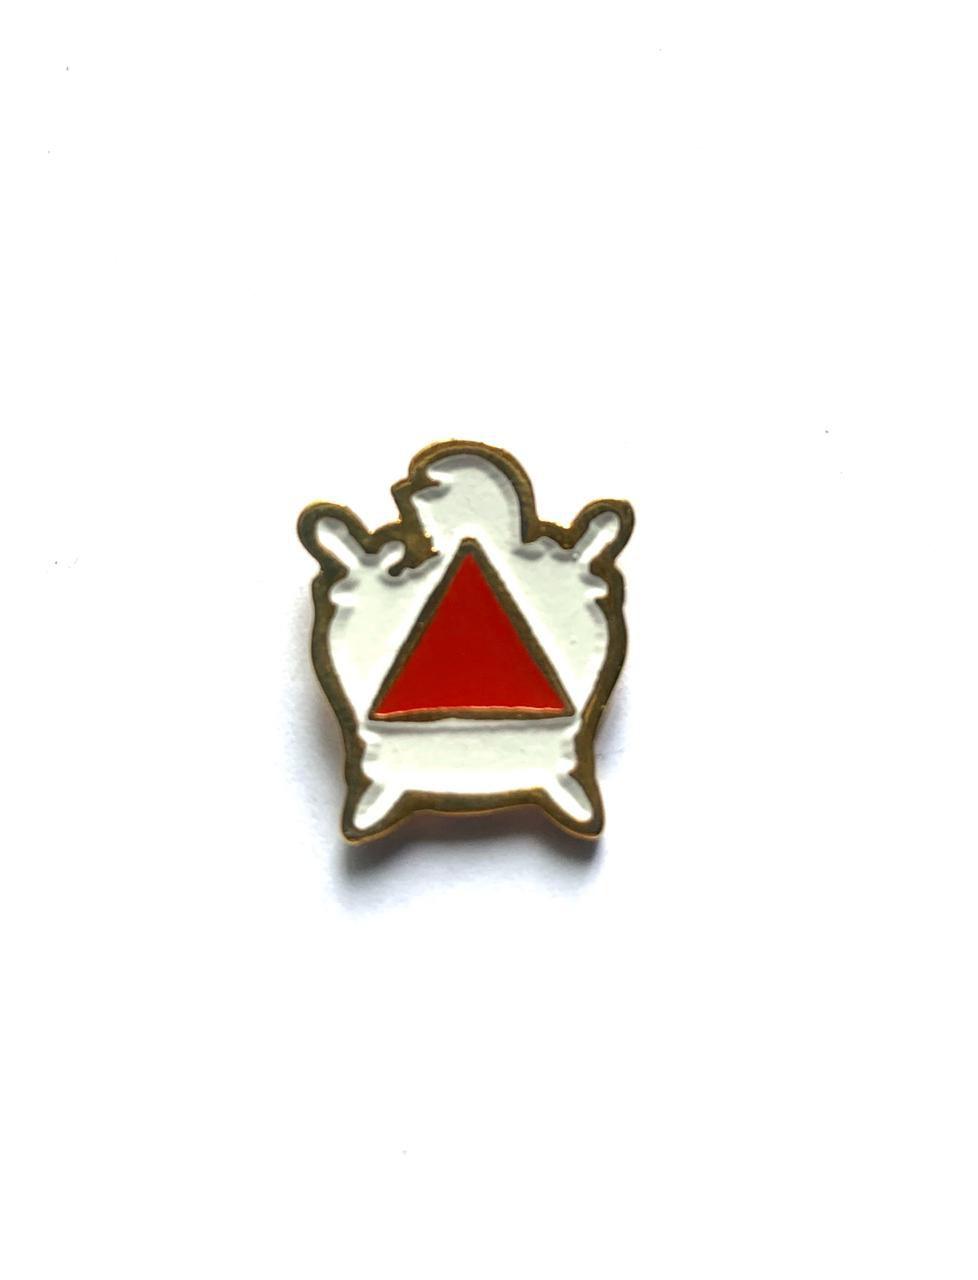 Pin DM - Minas